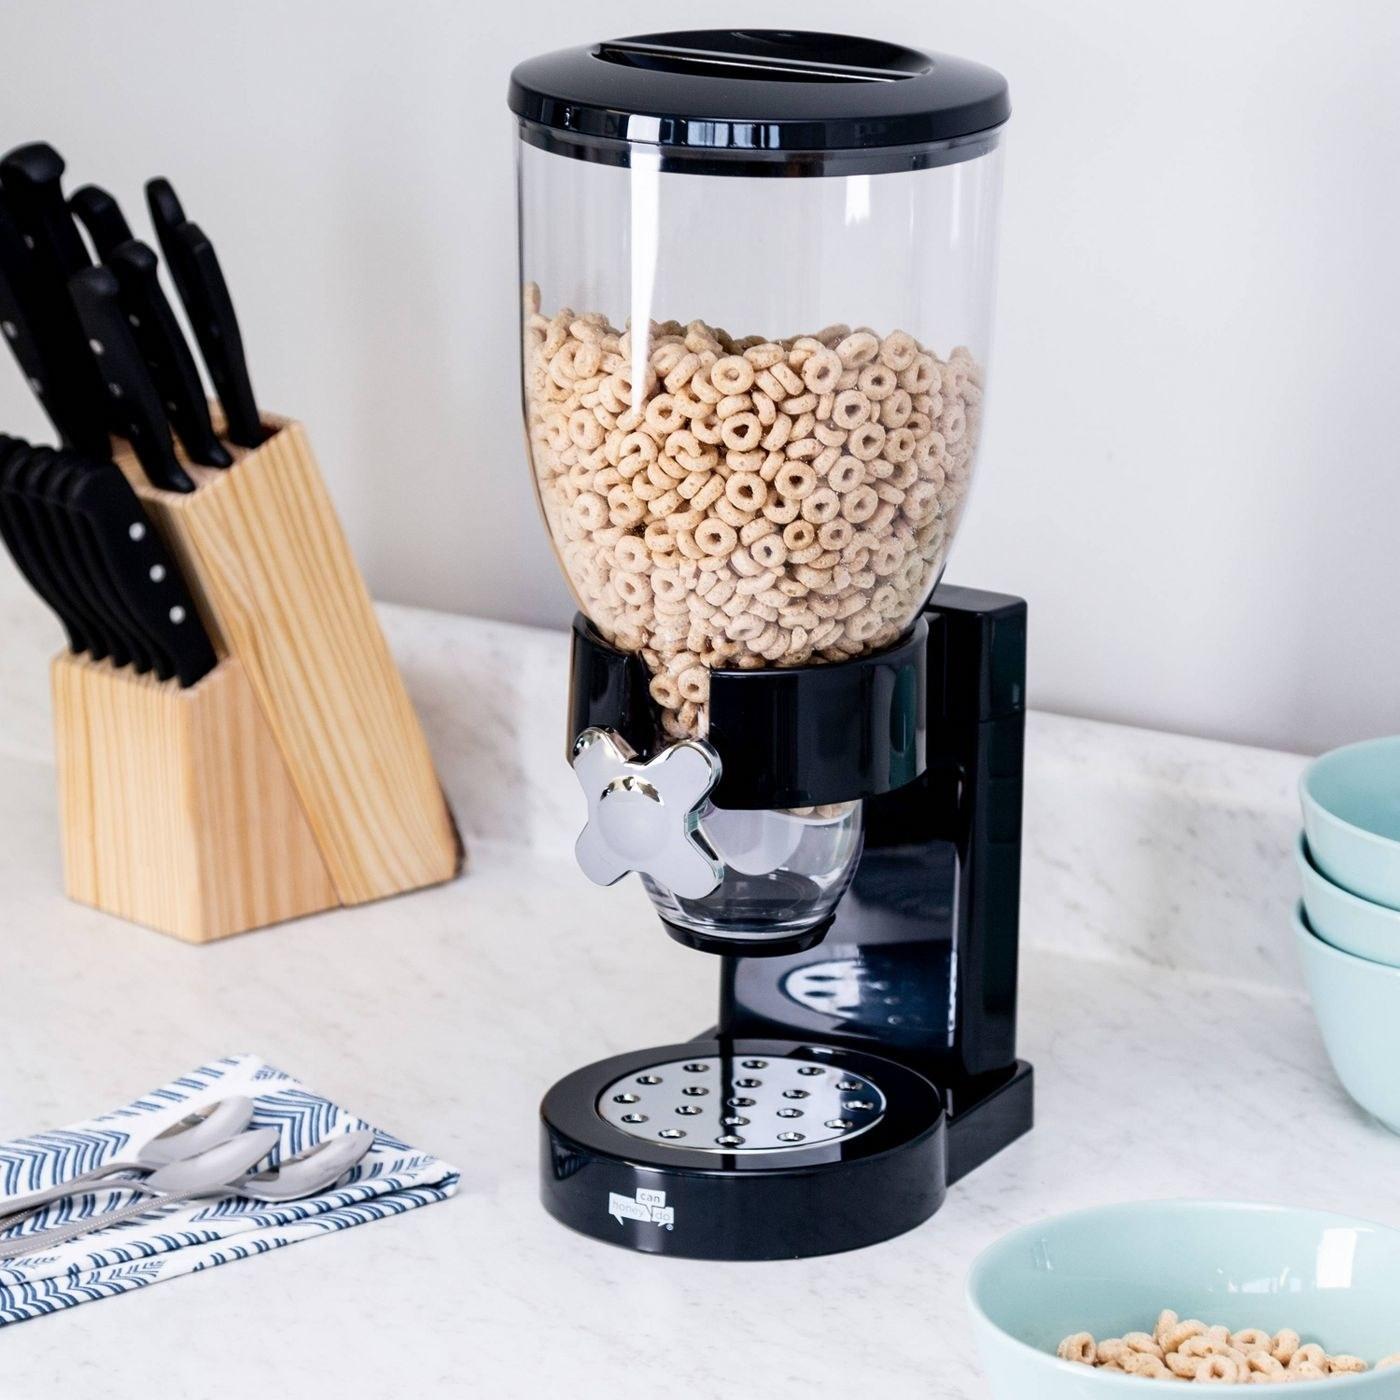 The black dry cereal dispenser